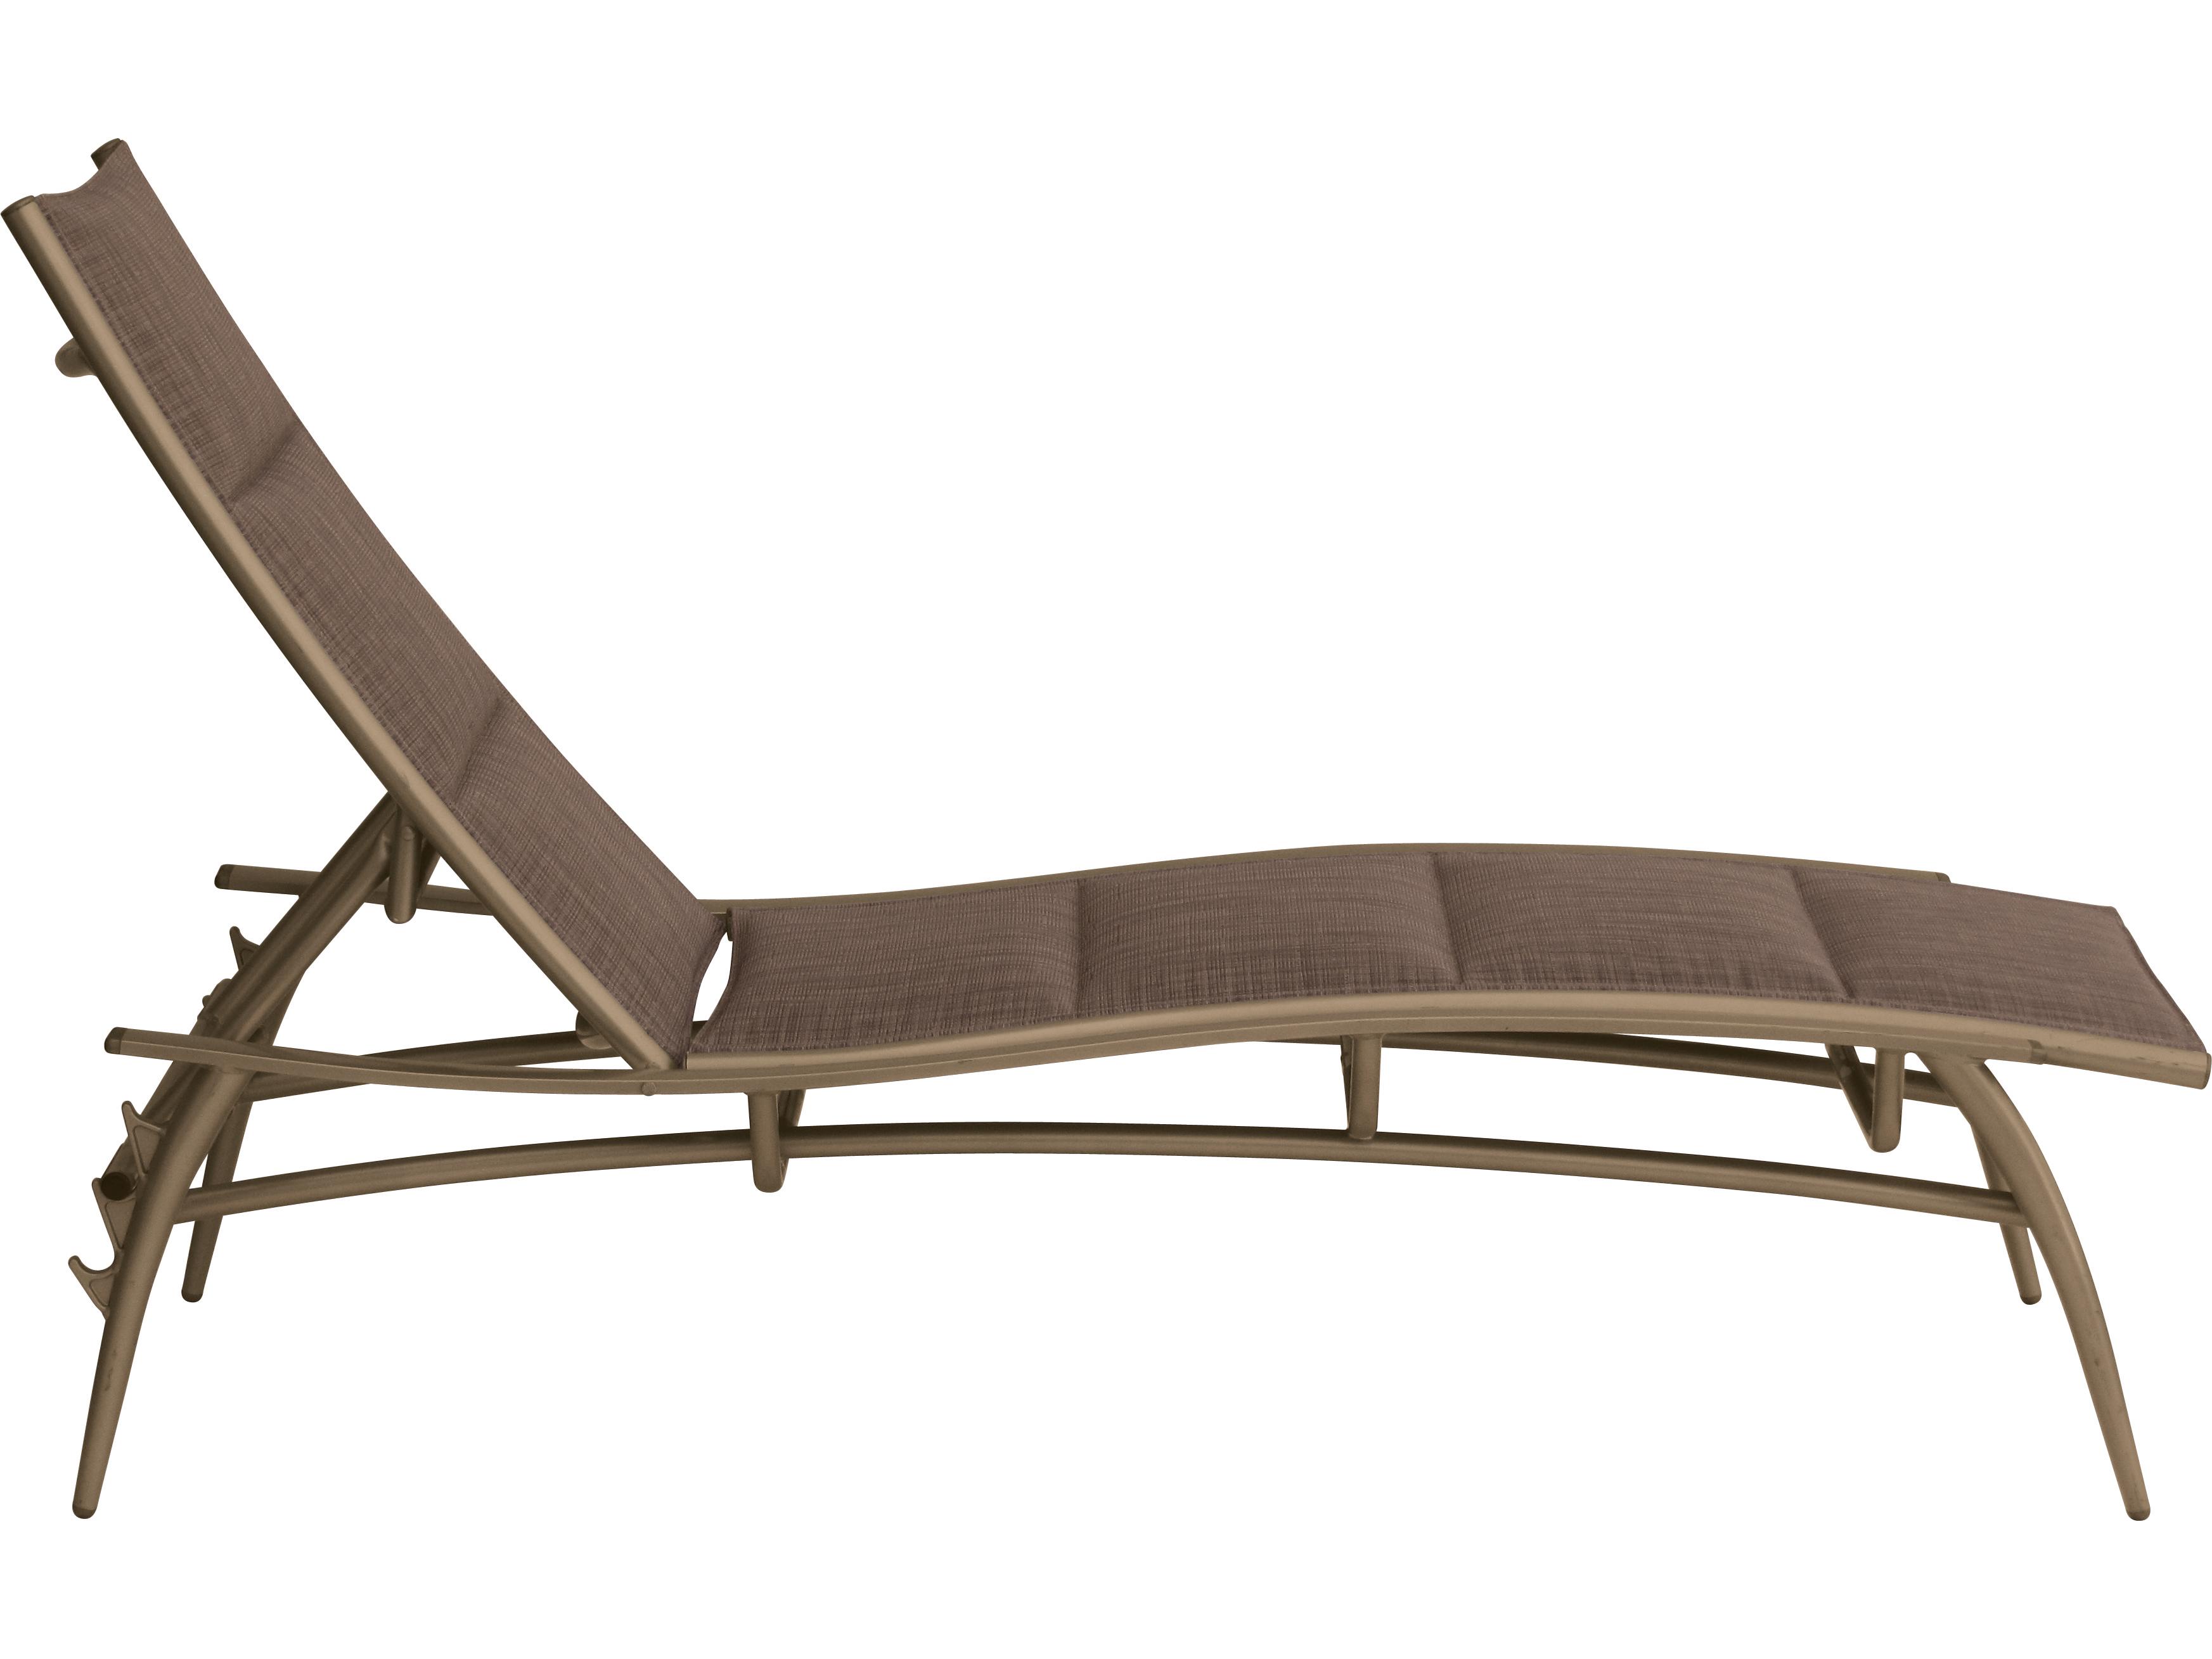 Tropitone echo padded sling aluminum chaise lounge 189932ps for Aluminum sling chaise lounge